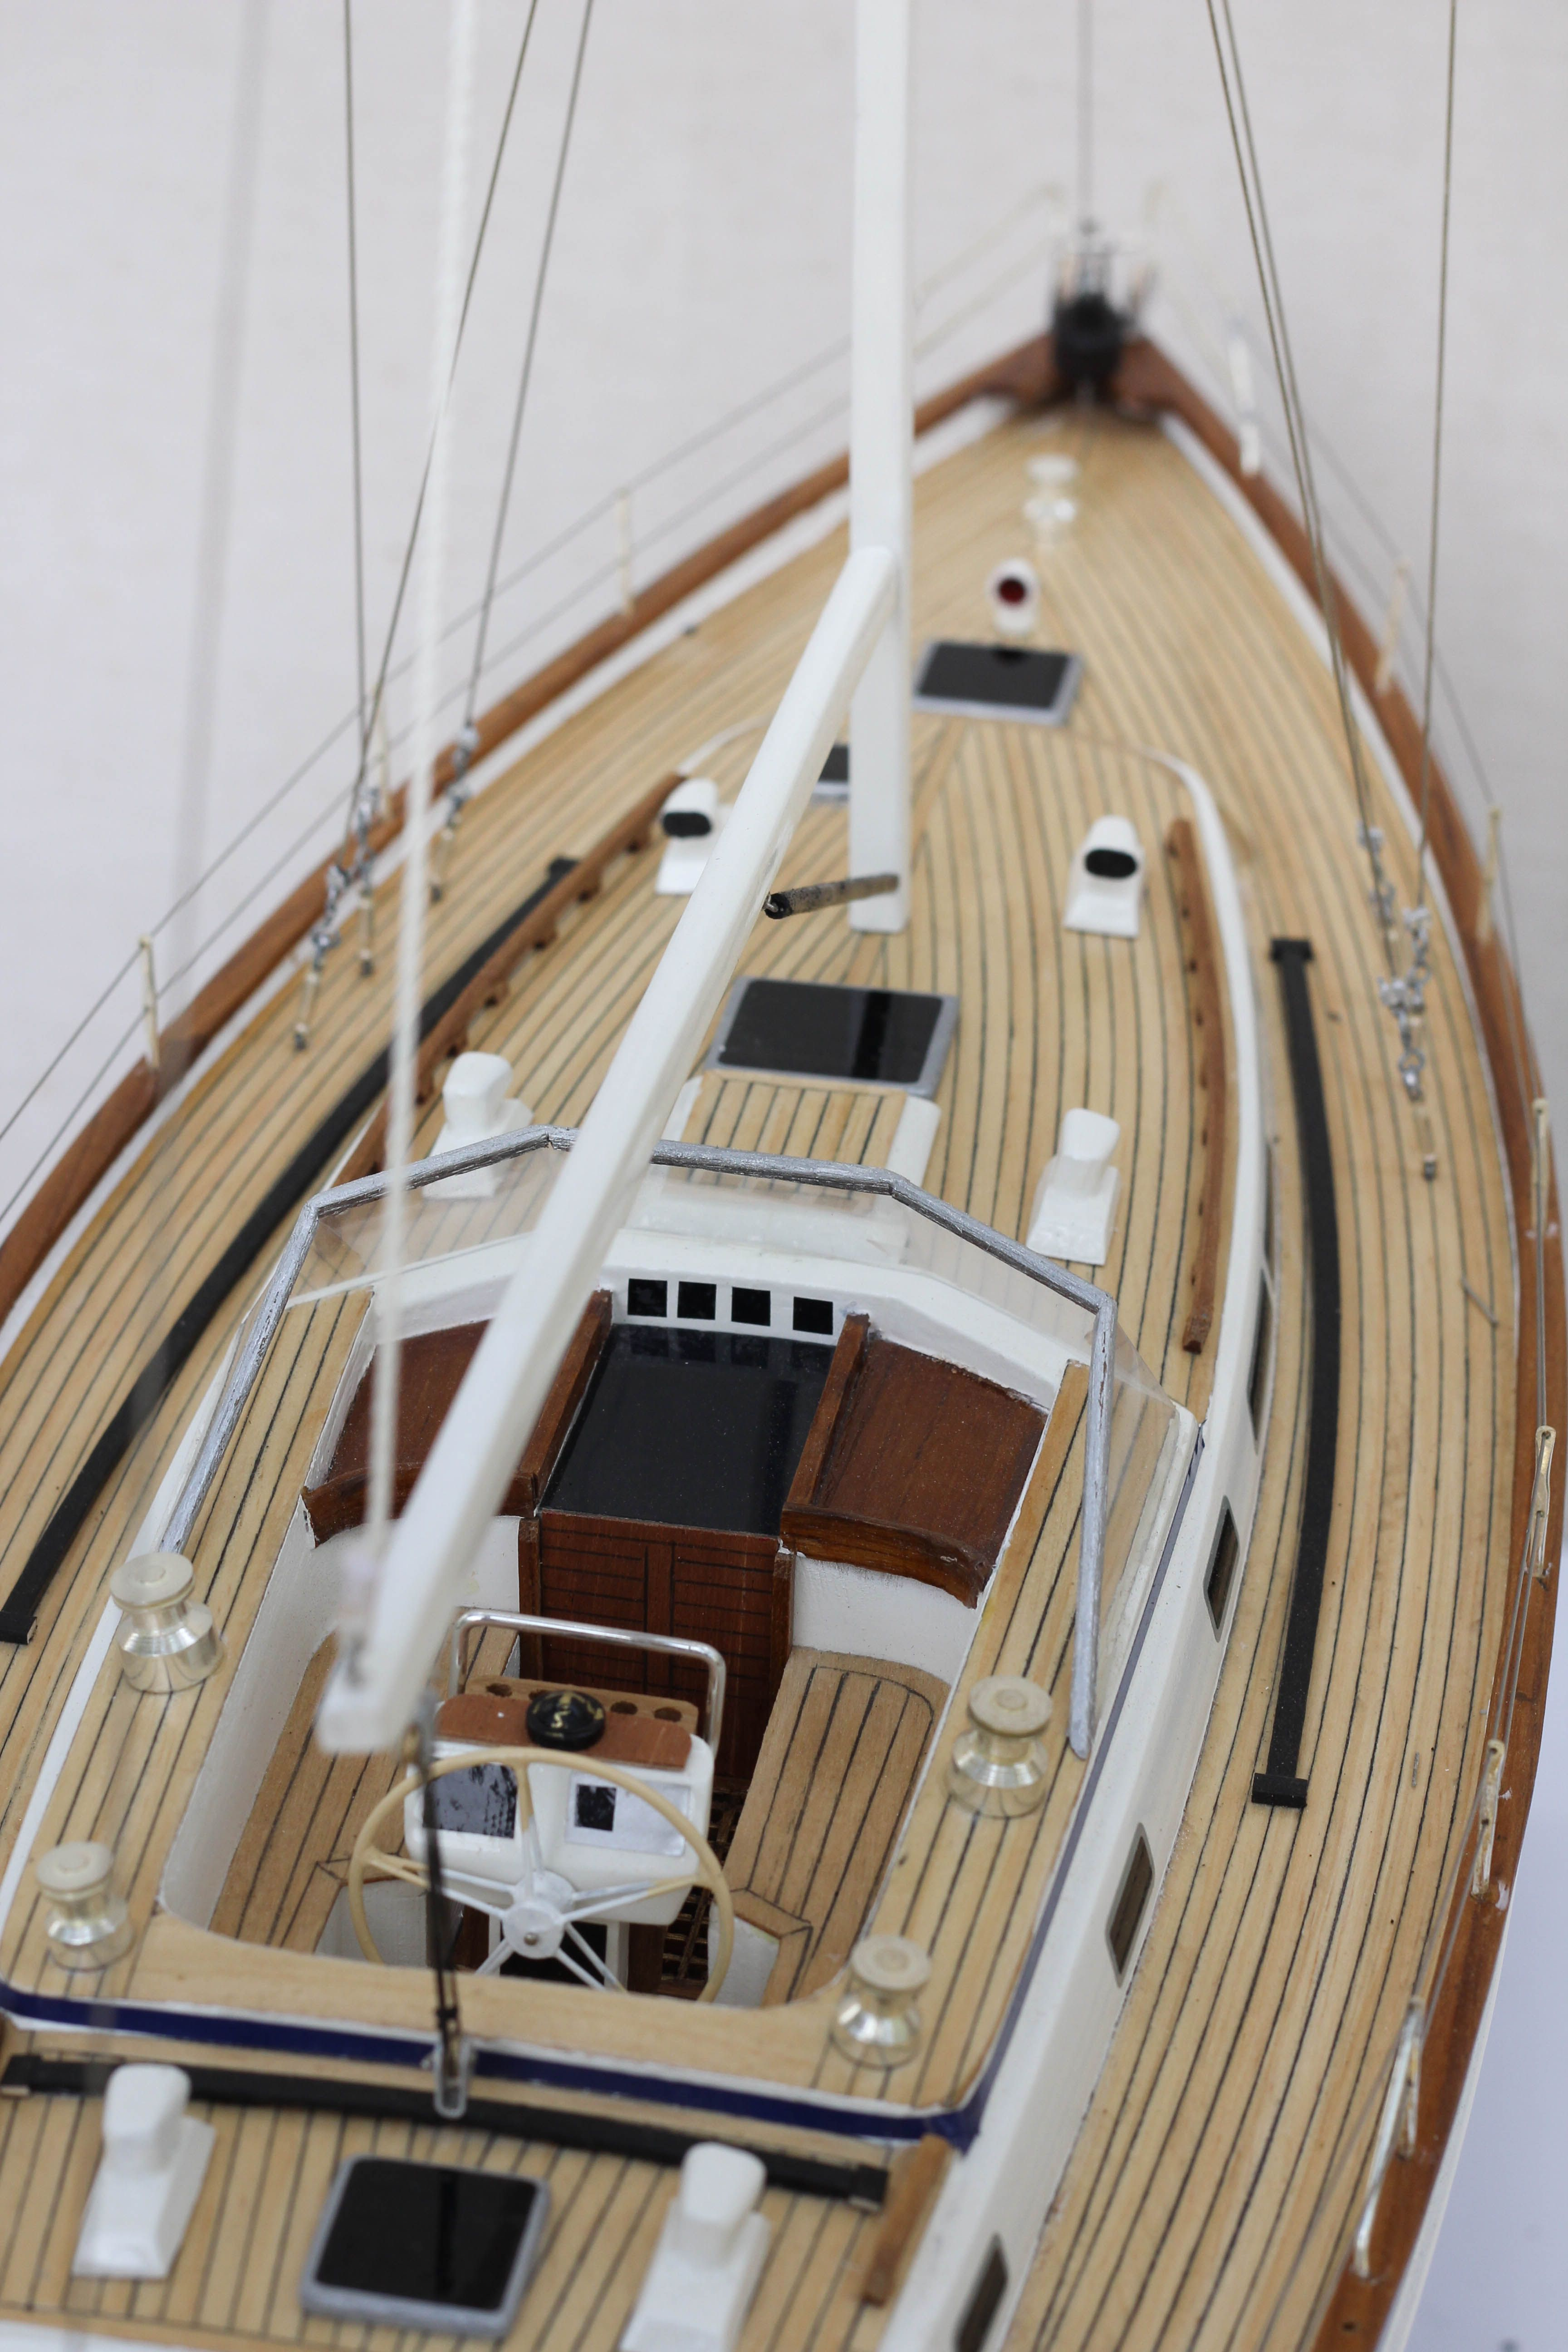 2541-14440-Halberg-Rassy-42-Model-Sailing-Boat-Superior-Range